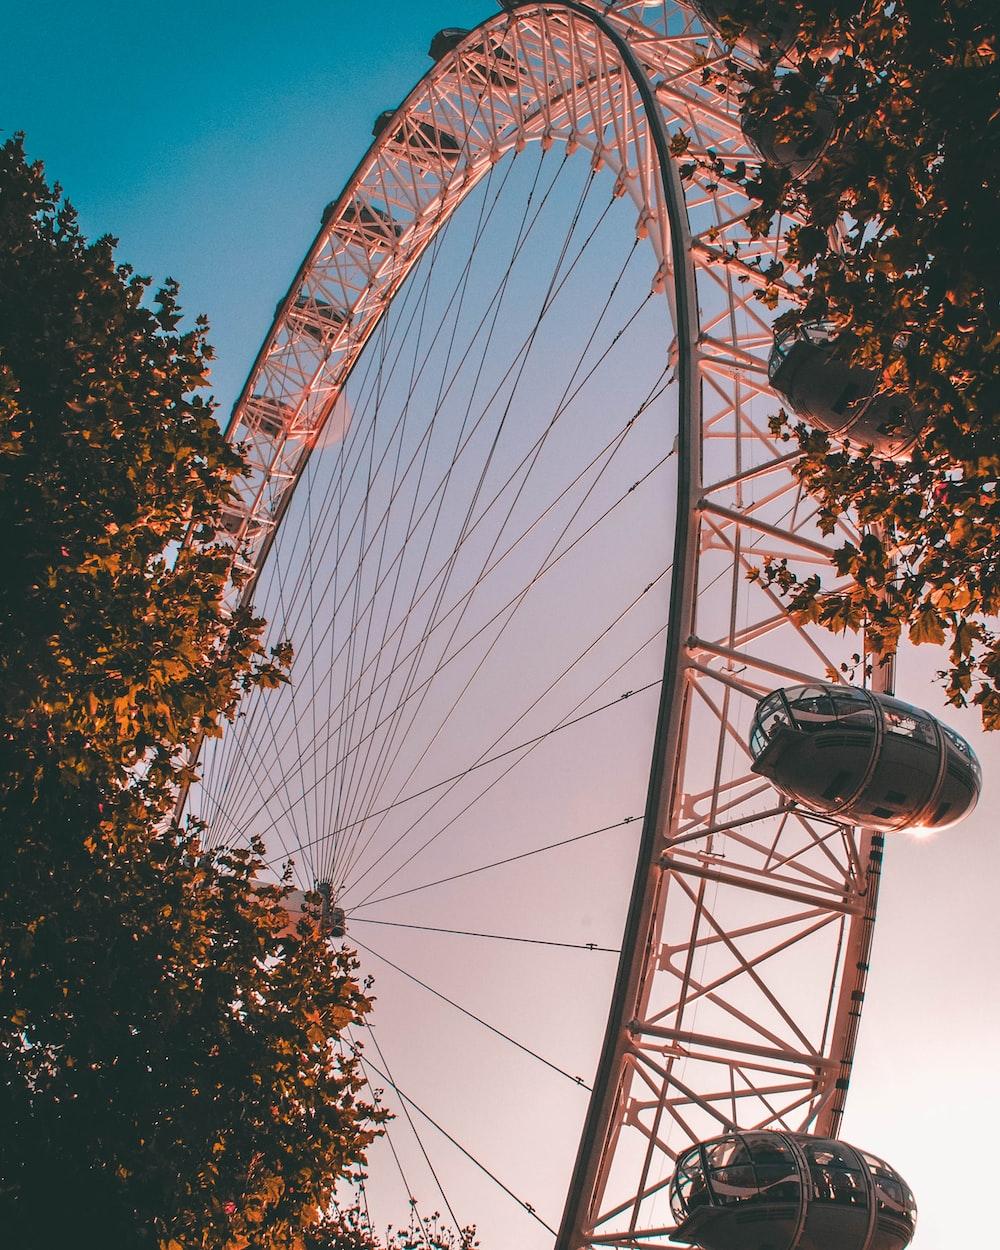 ground shot of ferris wheel